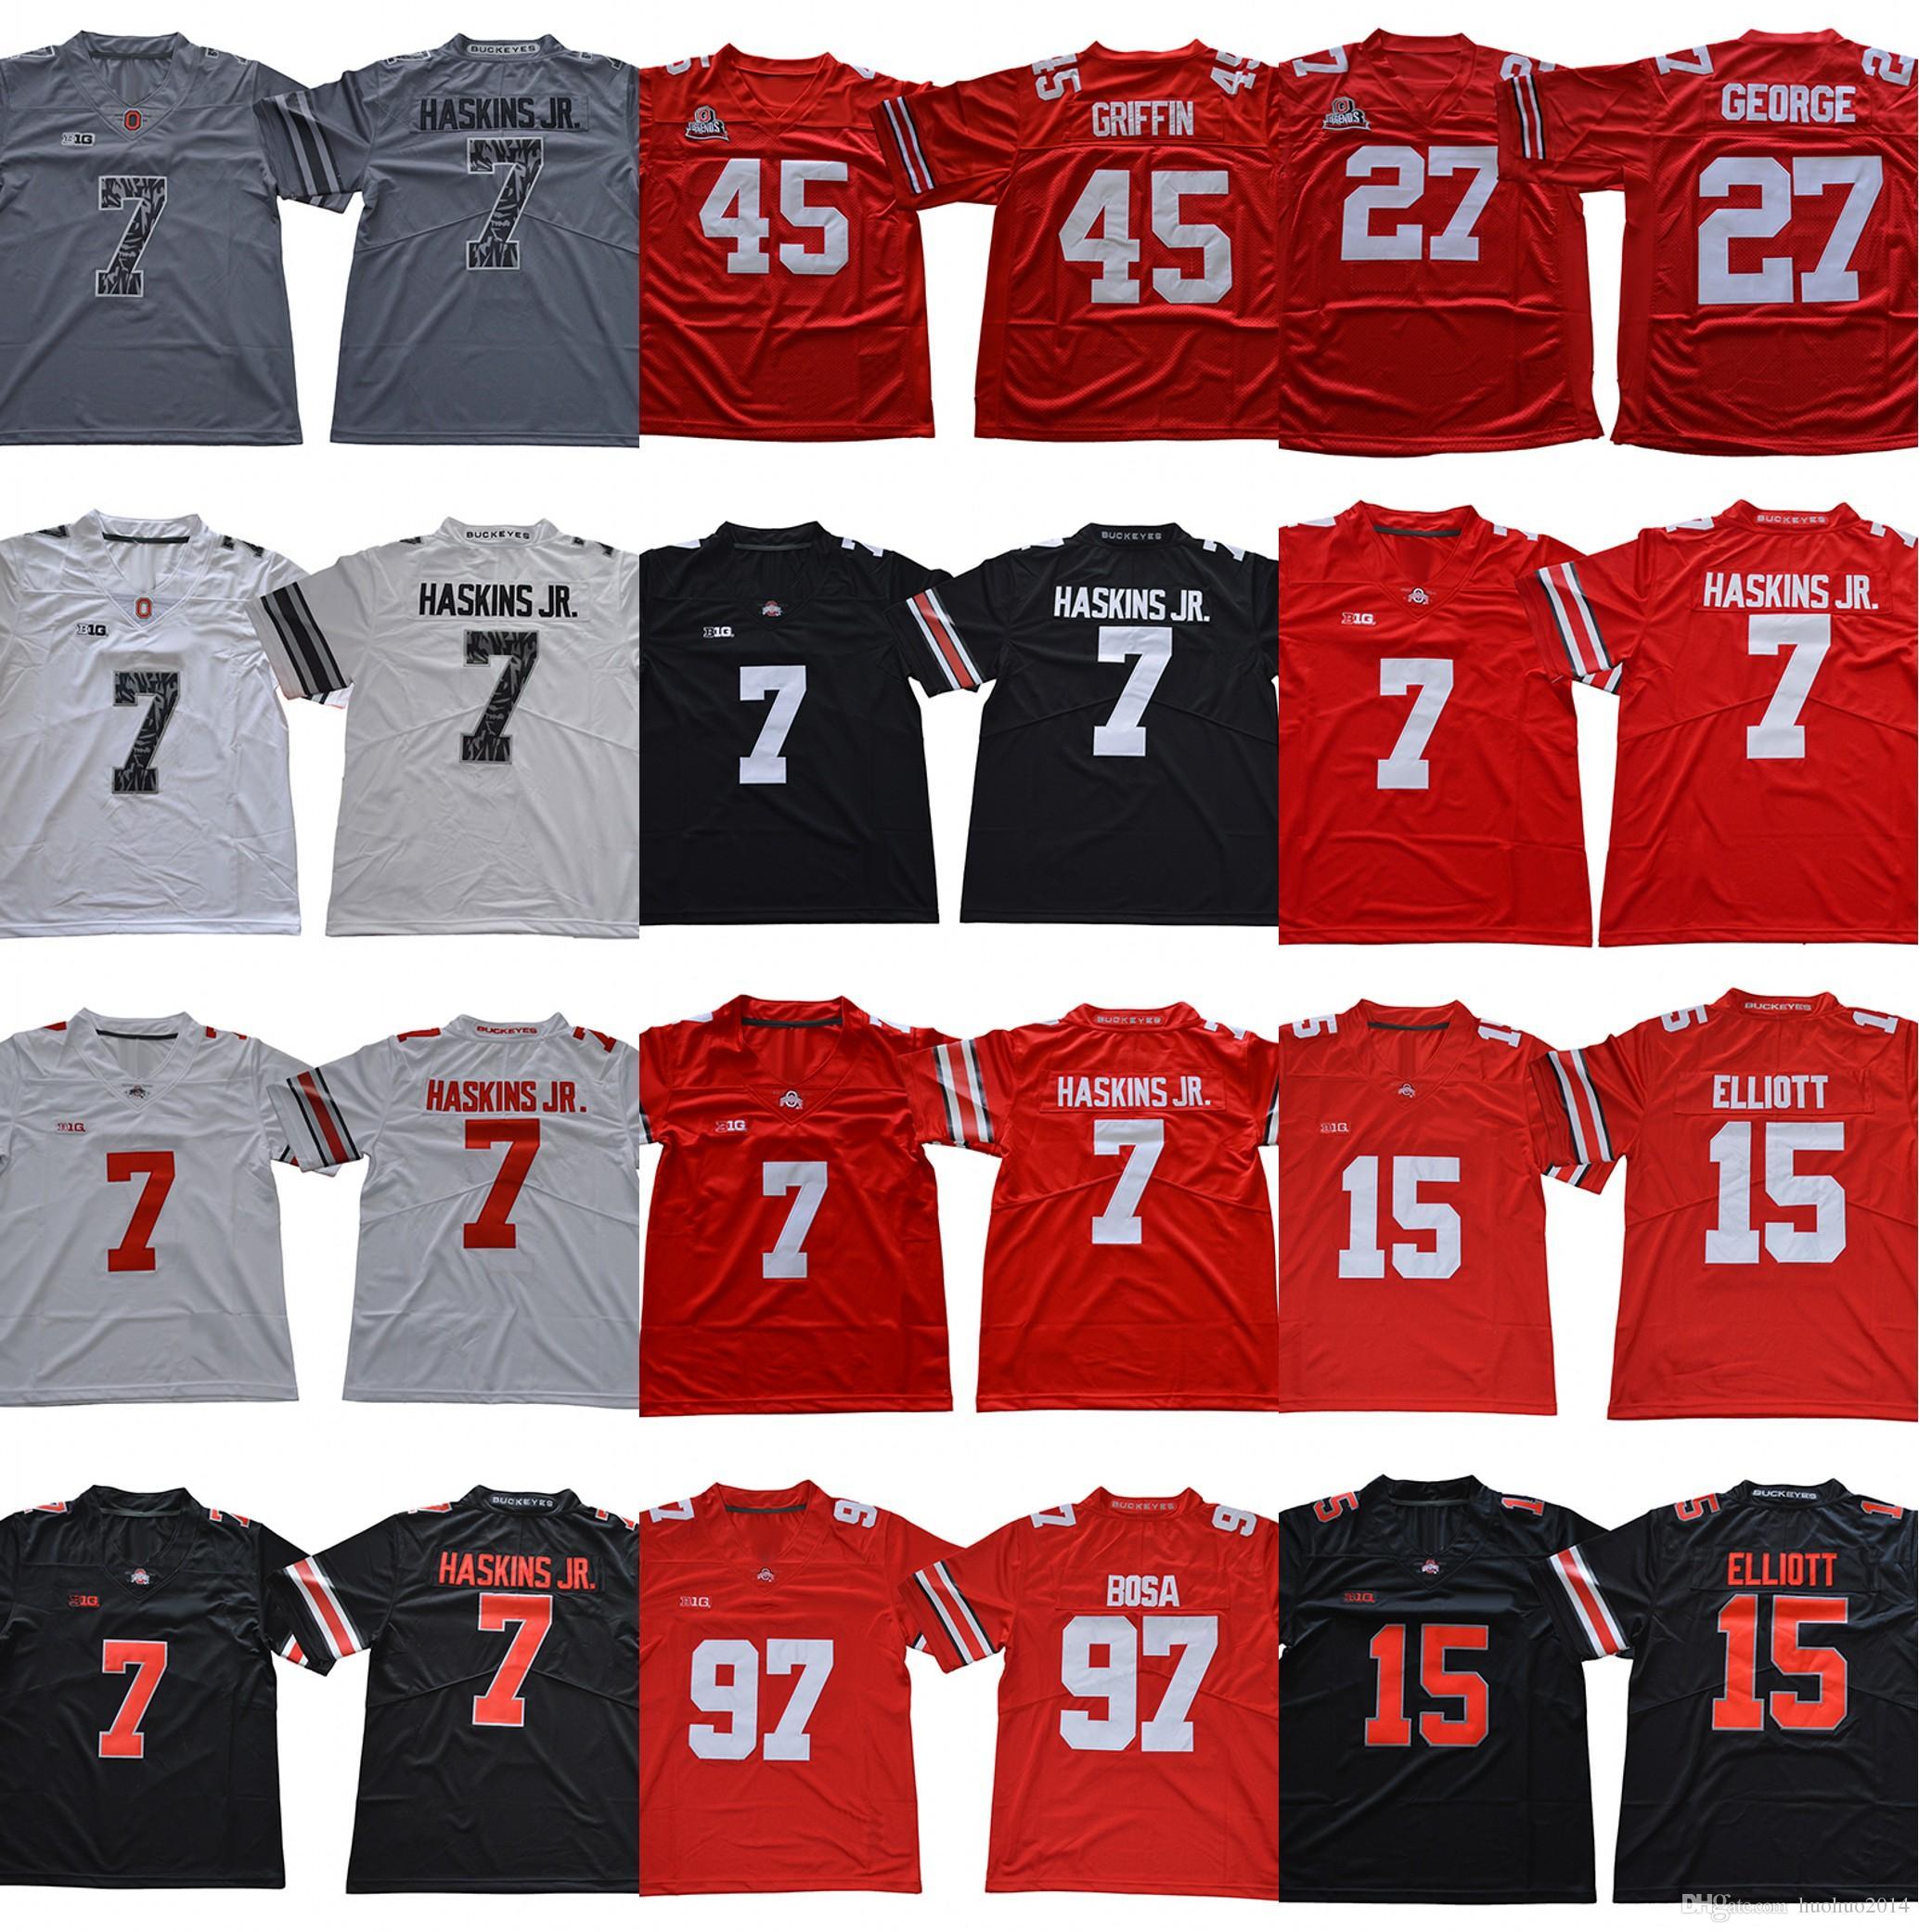 0ecc4c173e9 2019 2018 Ohio State Buckeyes 7 Dwayne Haskins Jr. 97 Nick Bosa 15 Ezekiel  Elliott 27 Eddie George 45 Archie Griffin Men College Football Jersey From  ...